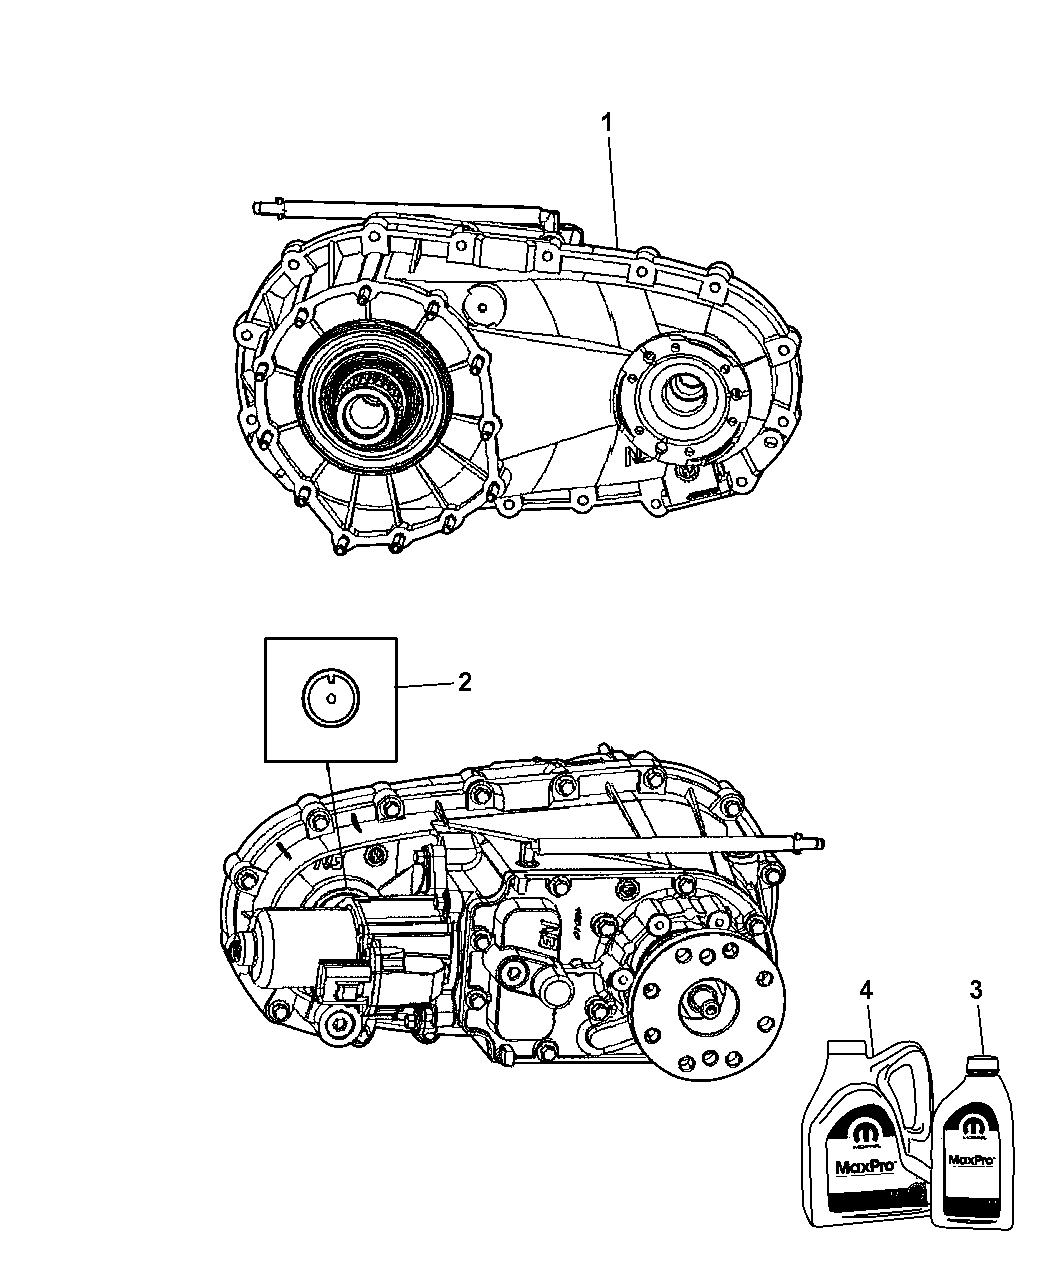 2011 Jeep Patriot Transmission: Genuine Jeep CASE